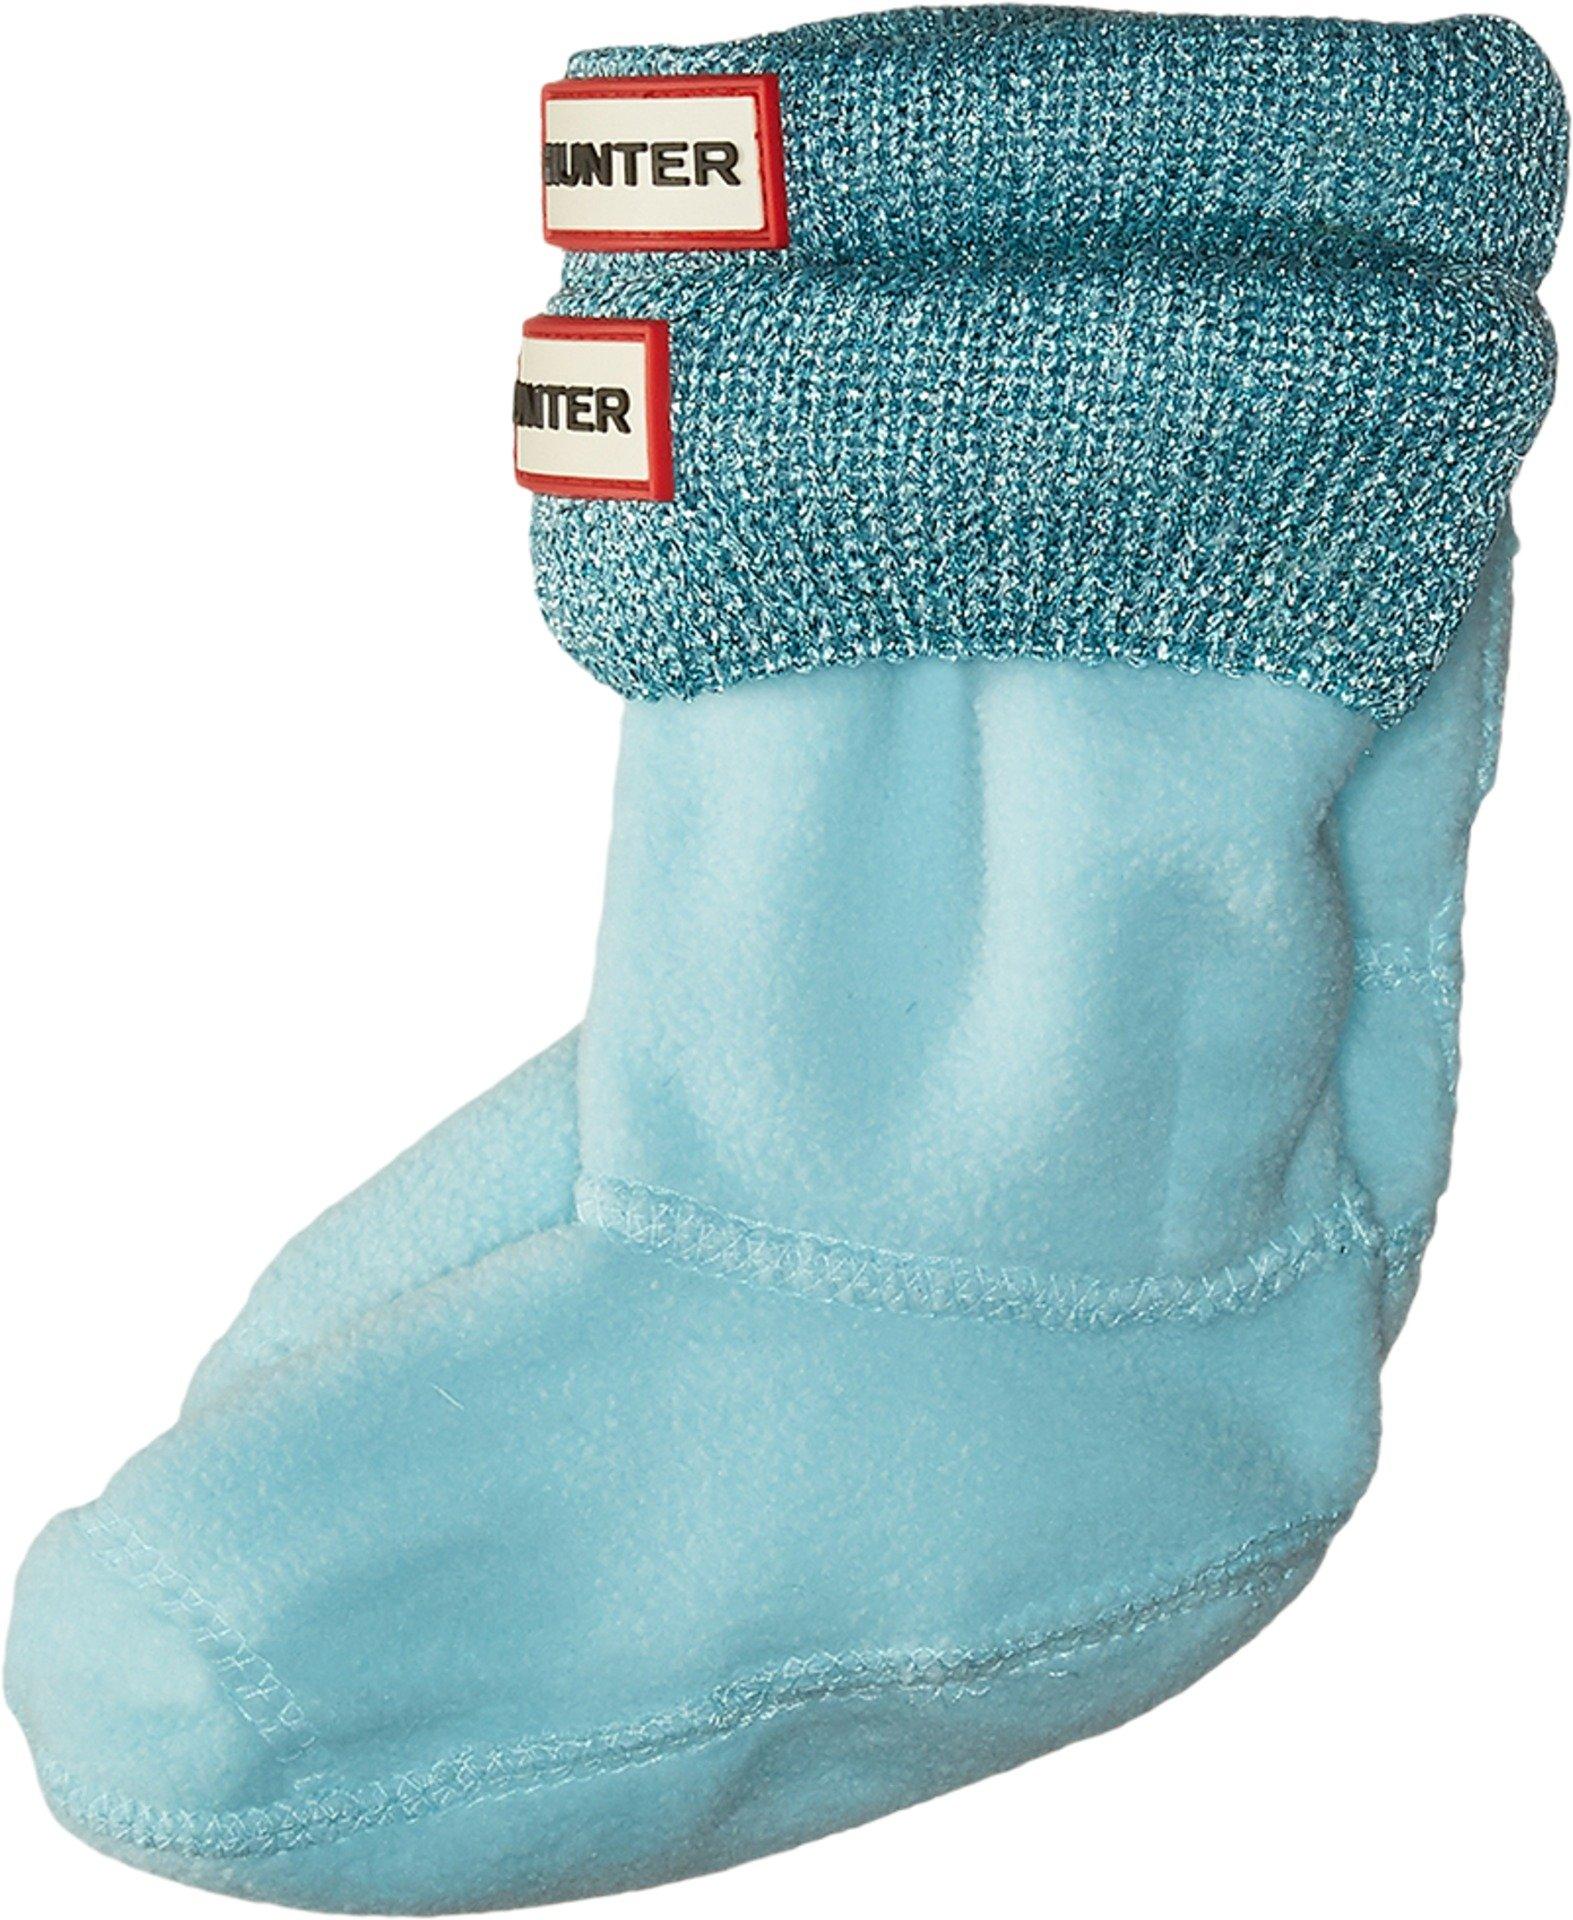 Hunter Kids Baby Girl's Glitter Boot Sock (Toddler/Little Kid/Big Kid) Pale Mint XS (Shoe 5-7 Toddler)